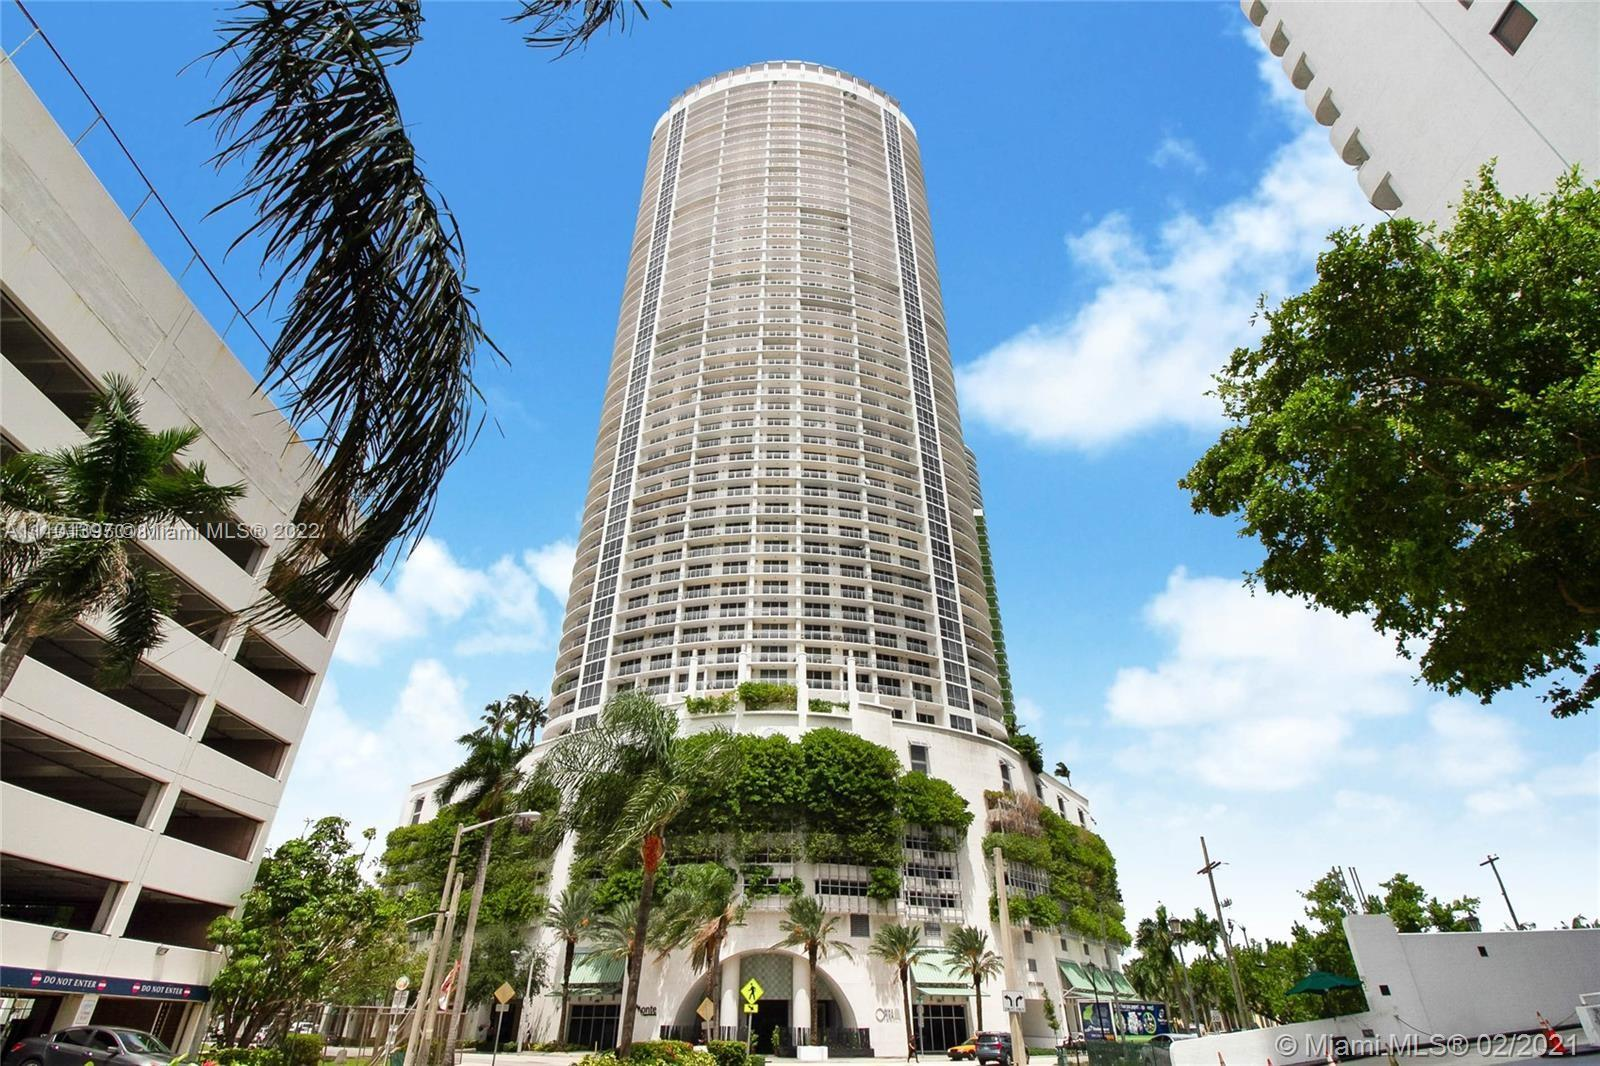 OPERA TOWER CONDO Condo,For Sale,OPERA TOWER CONDO Brickell,realty,broker,condos near me